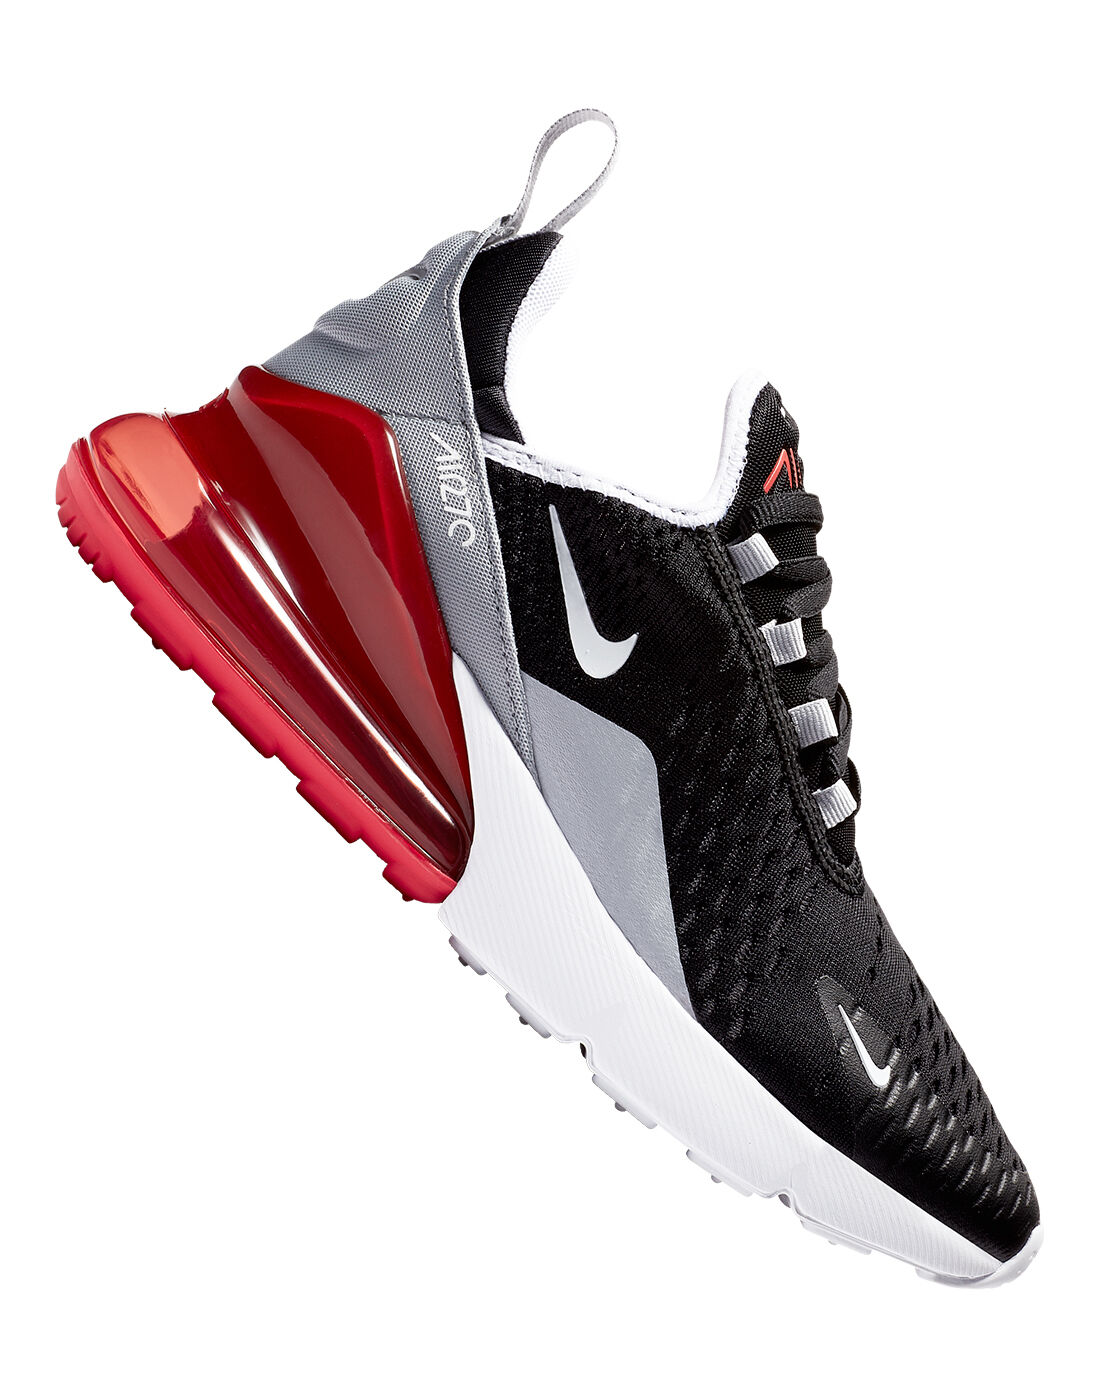 Kid's Black \u0026 Red Nike Air Max 270